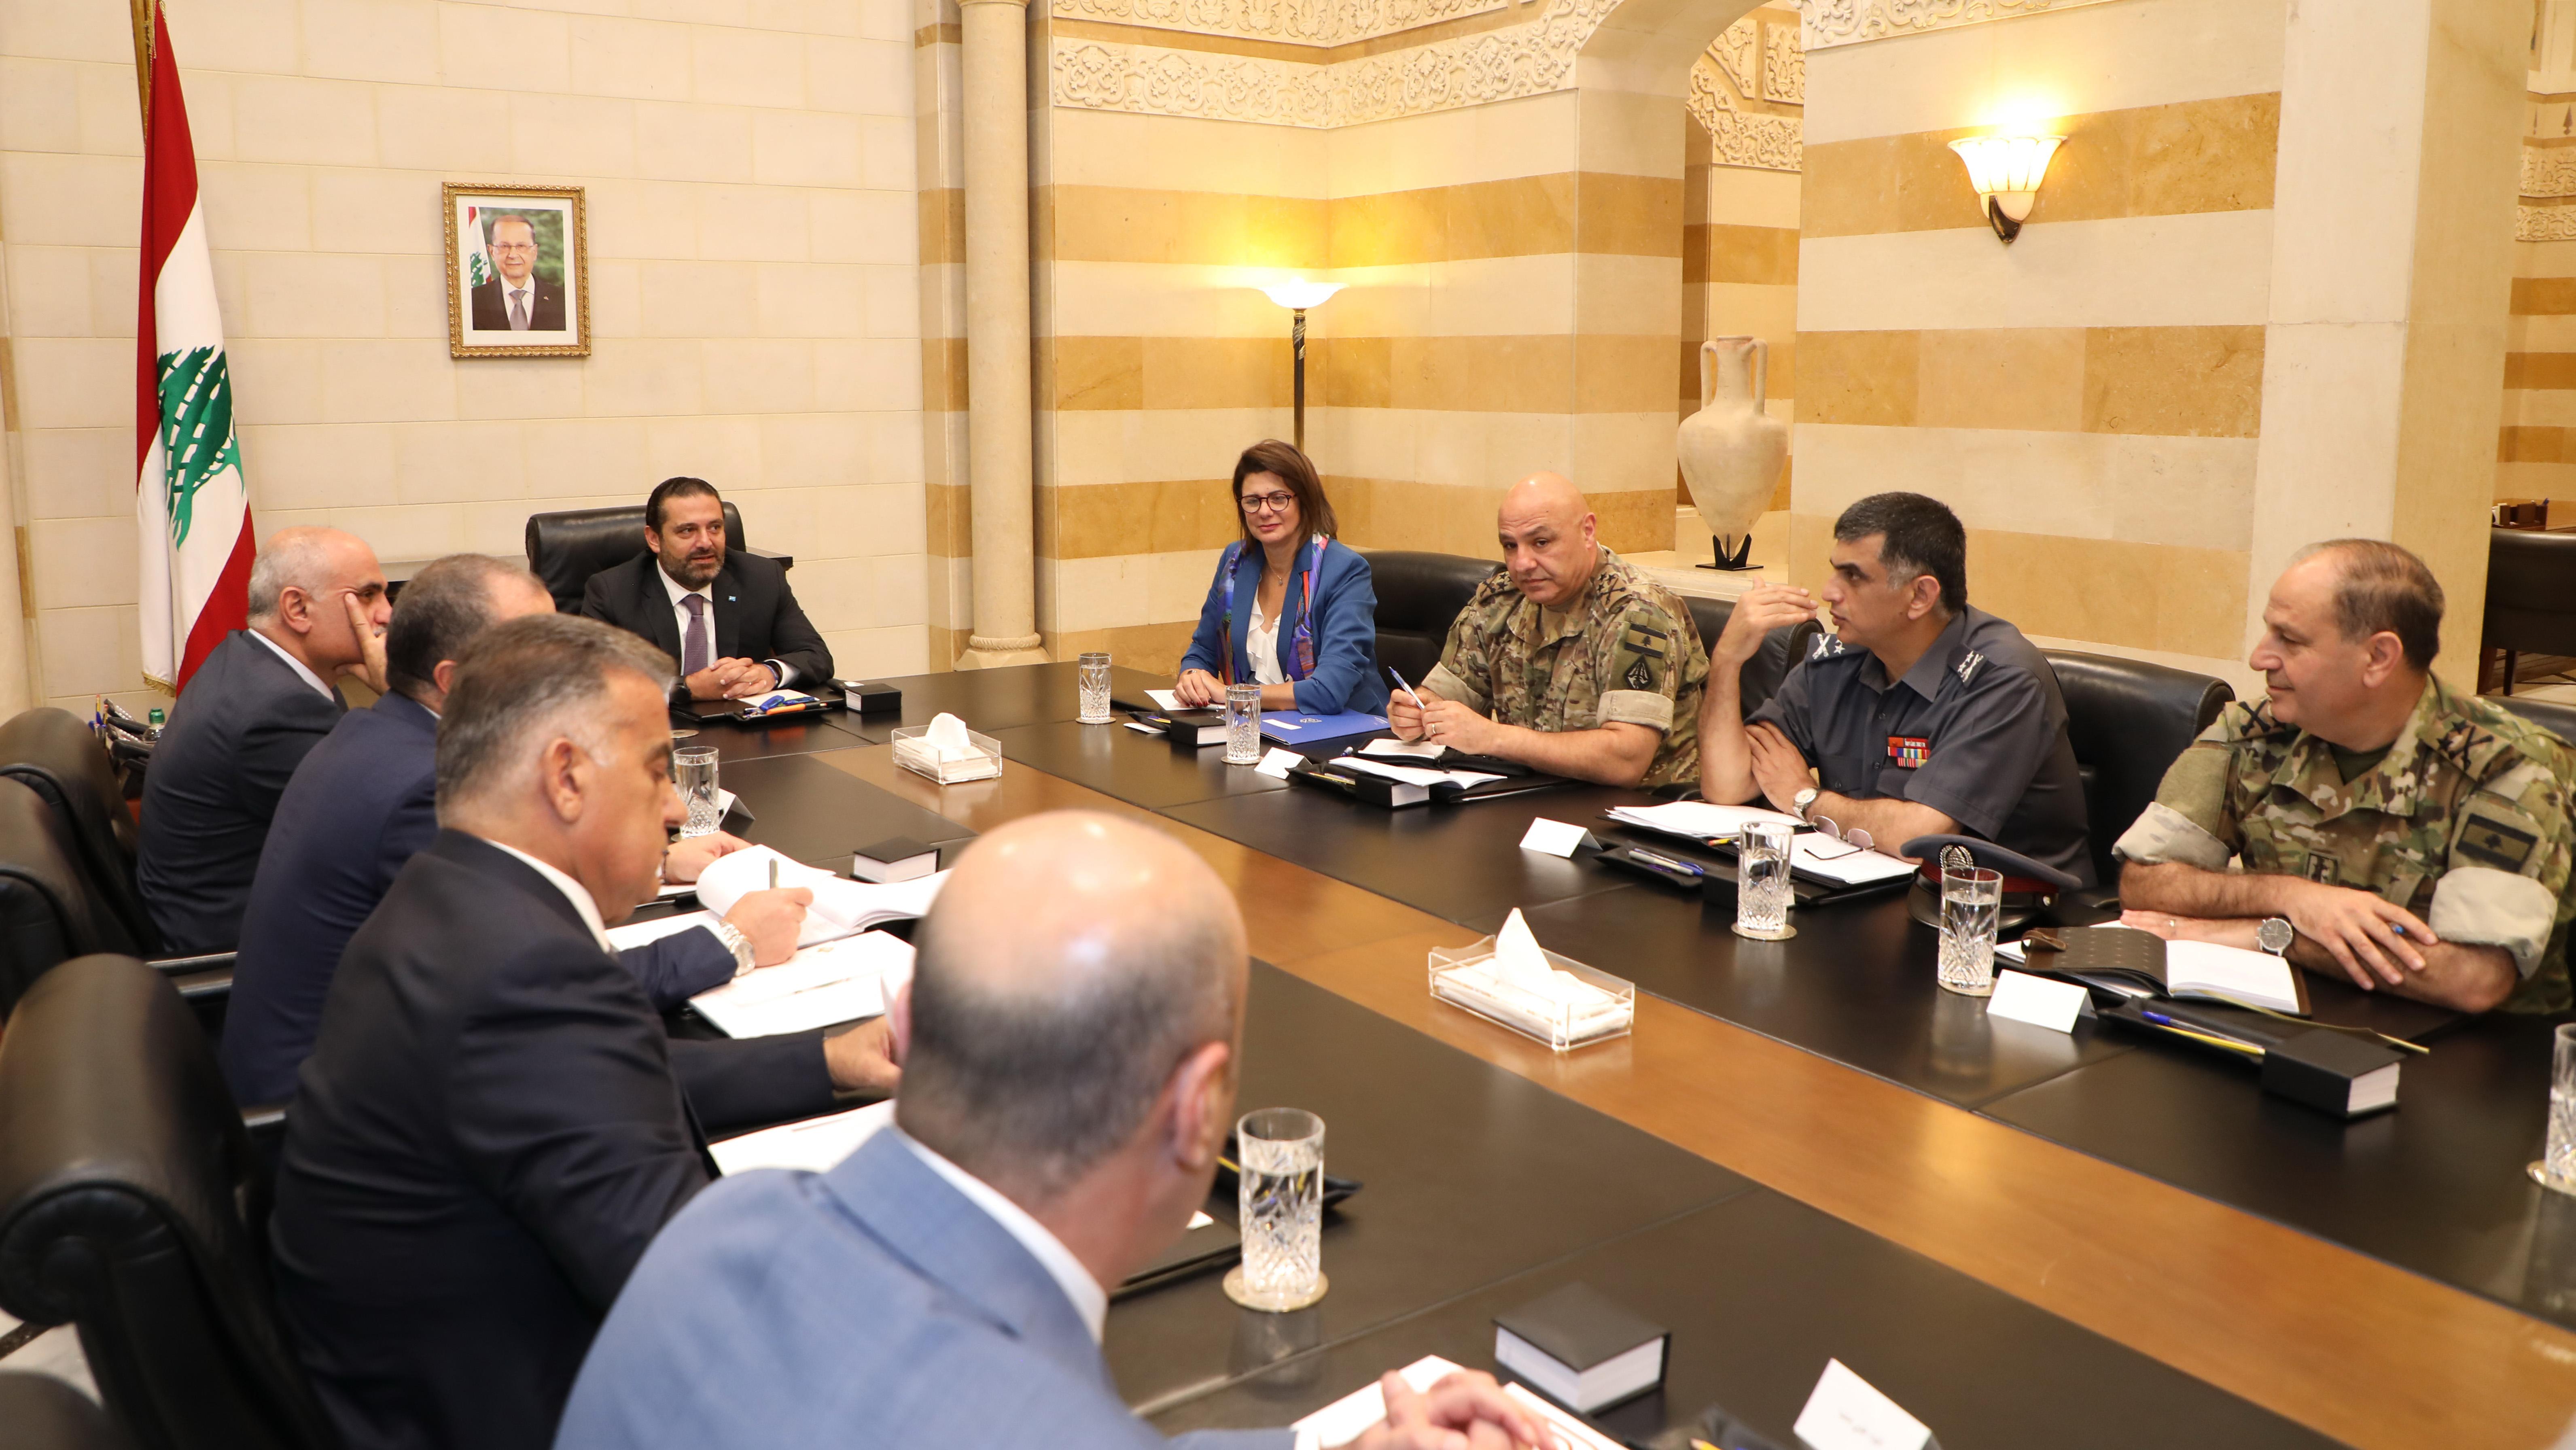 Pr Miinister Saad Hariri meets Luxenburg Deputy Pr Minister 2